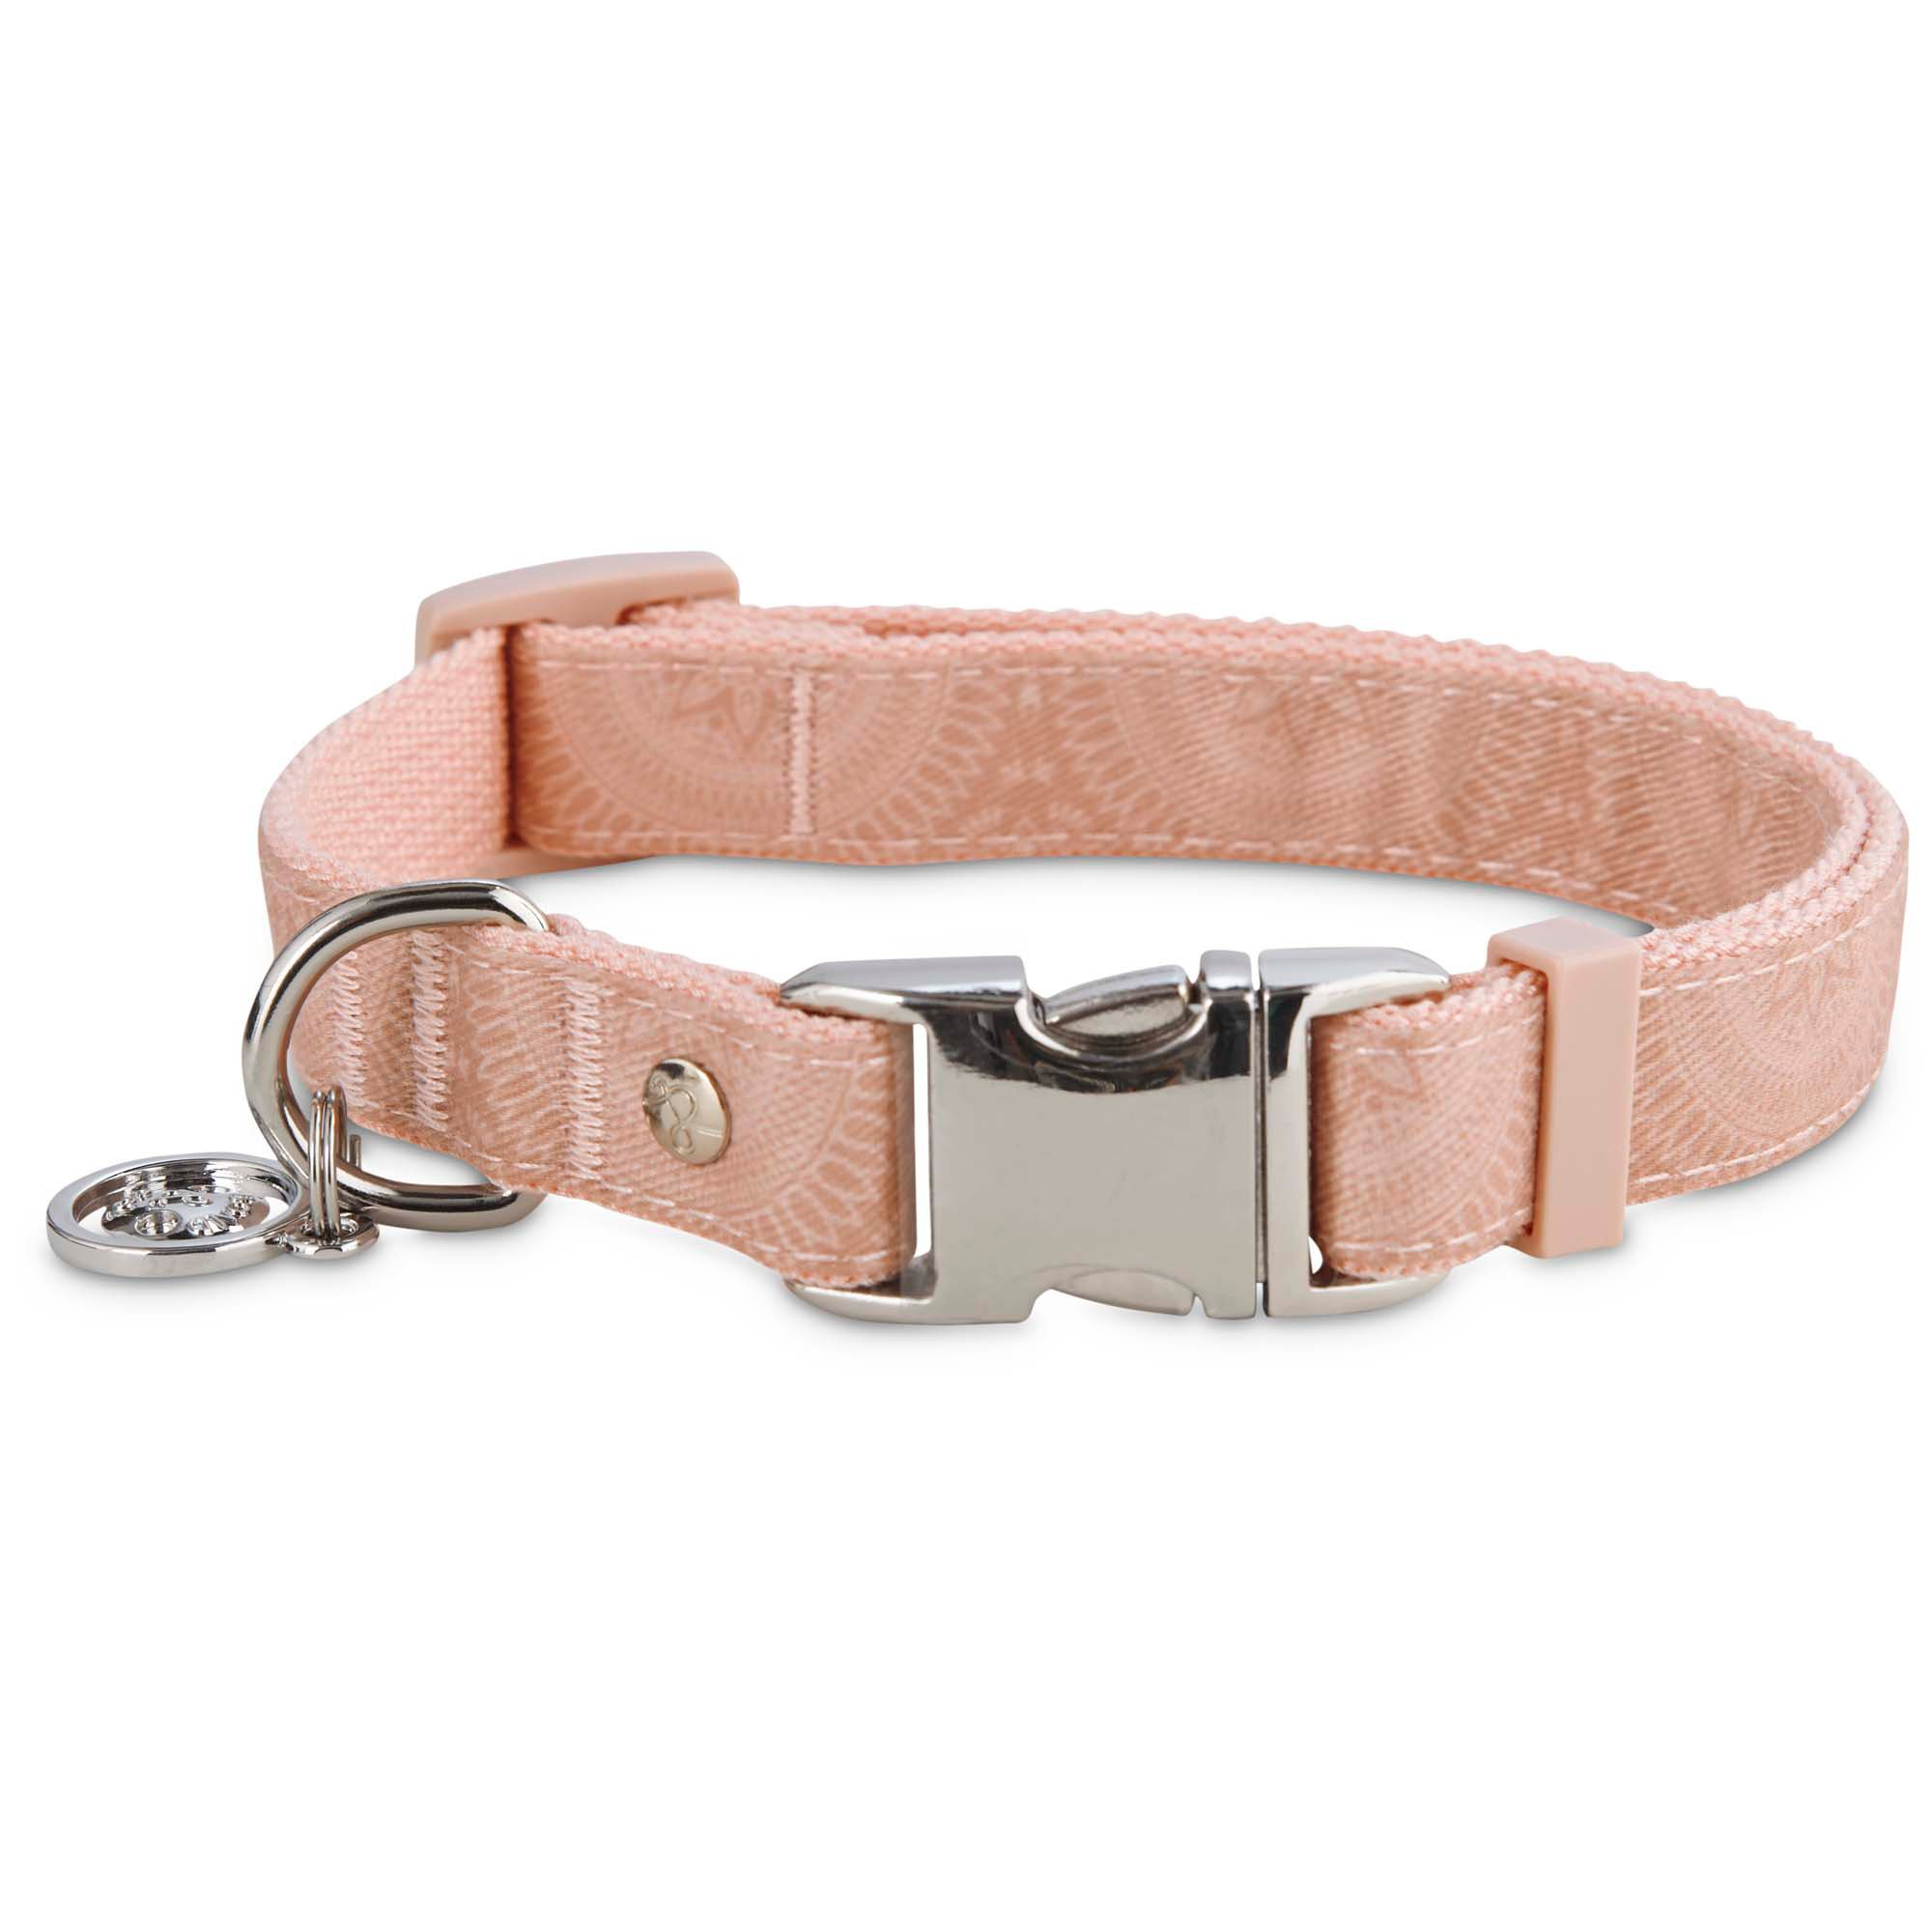 Serenity Pink Medallion Adjustable Dog Collar